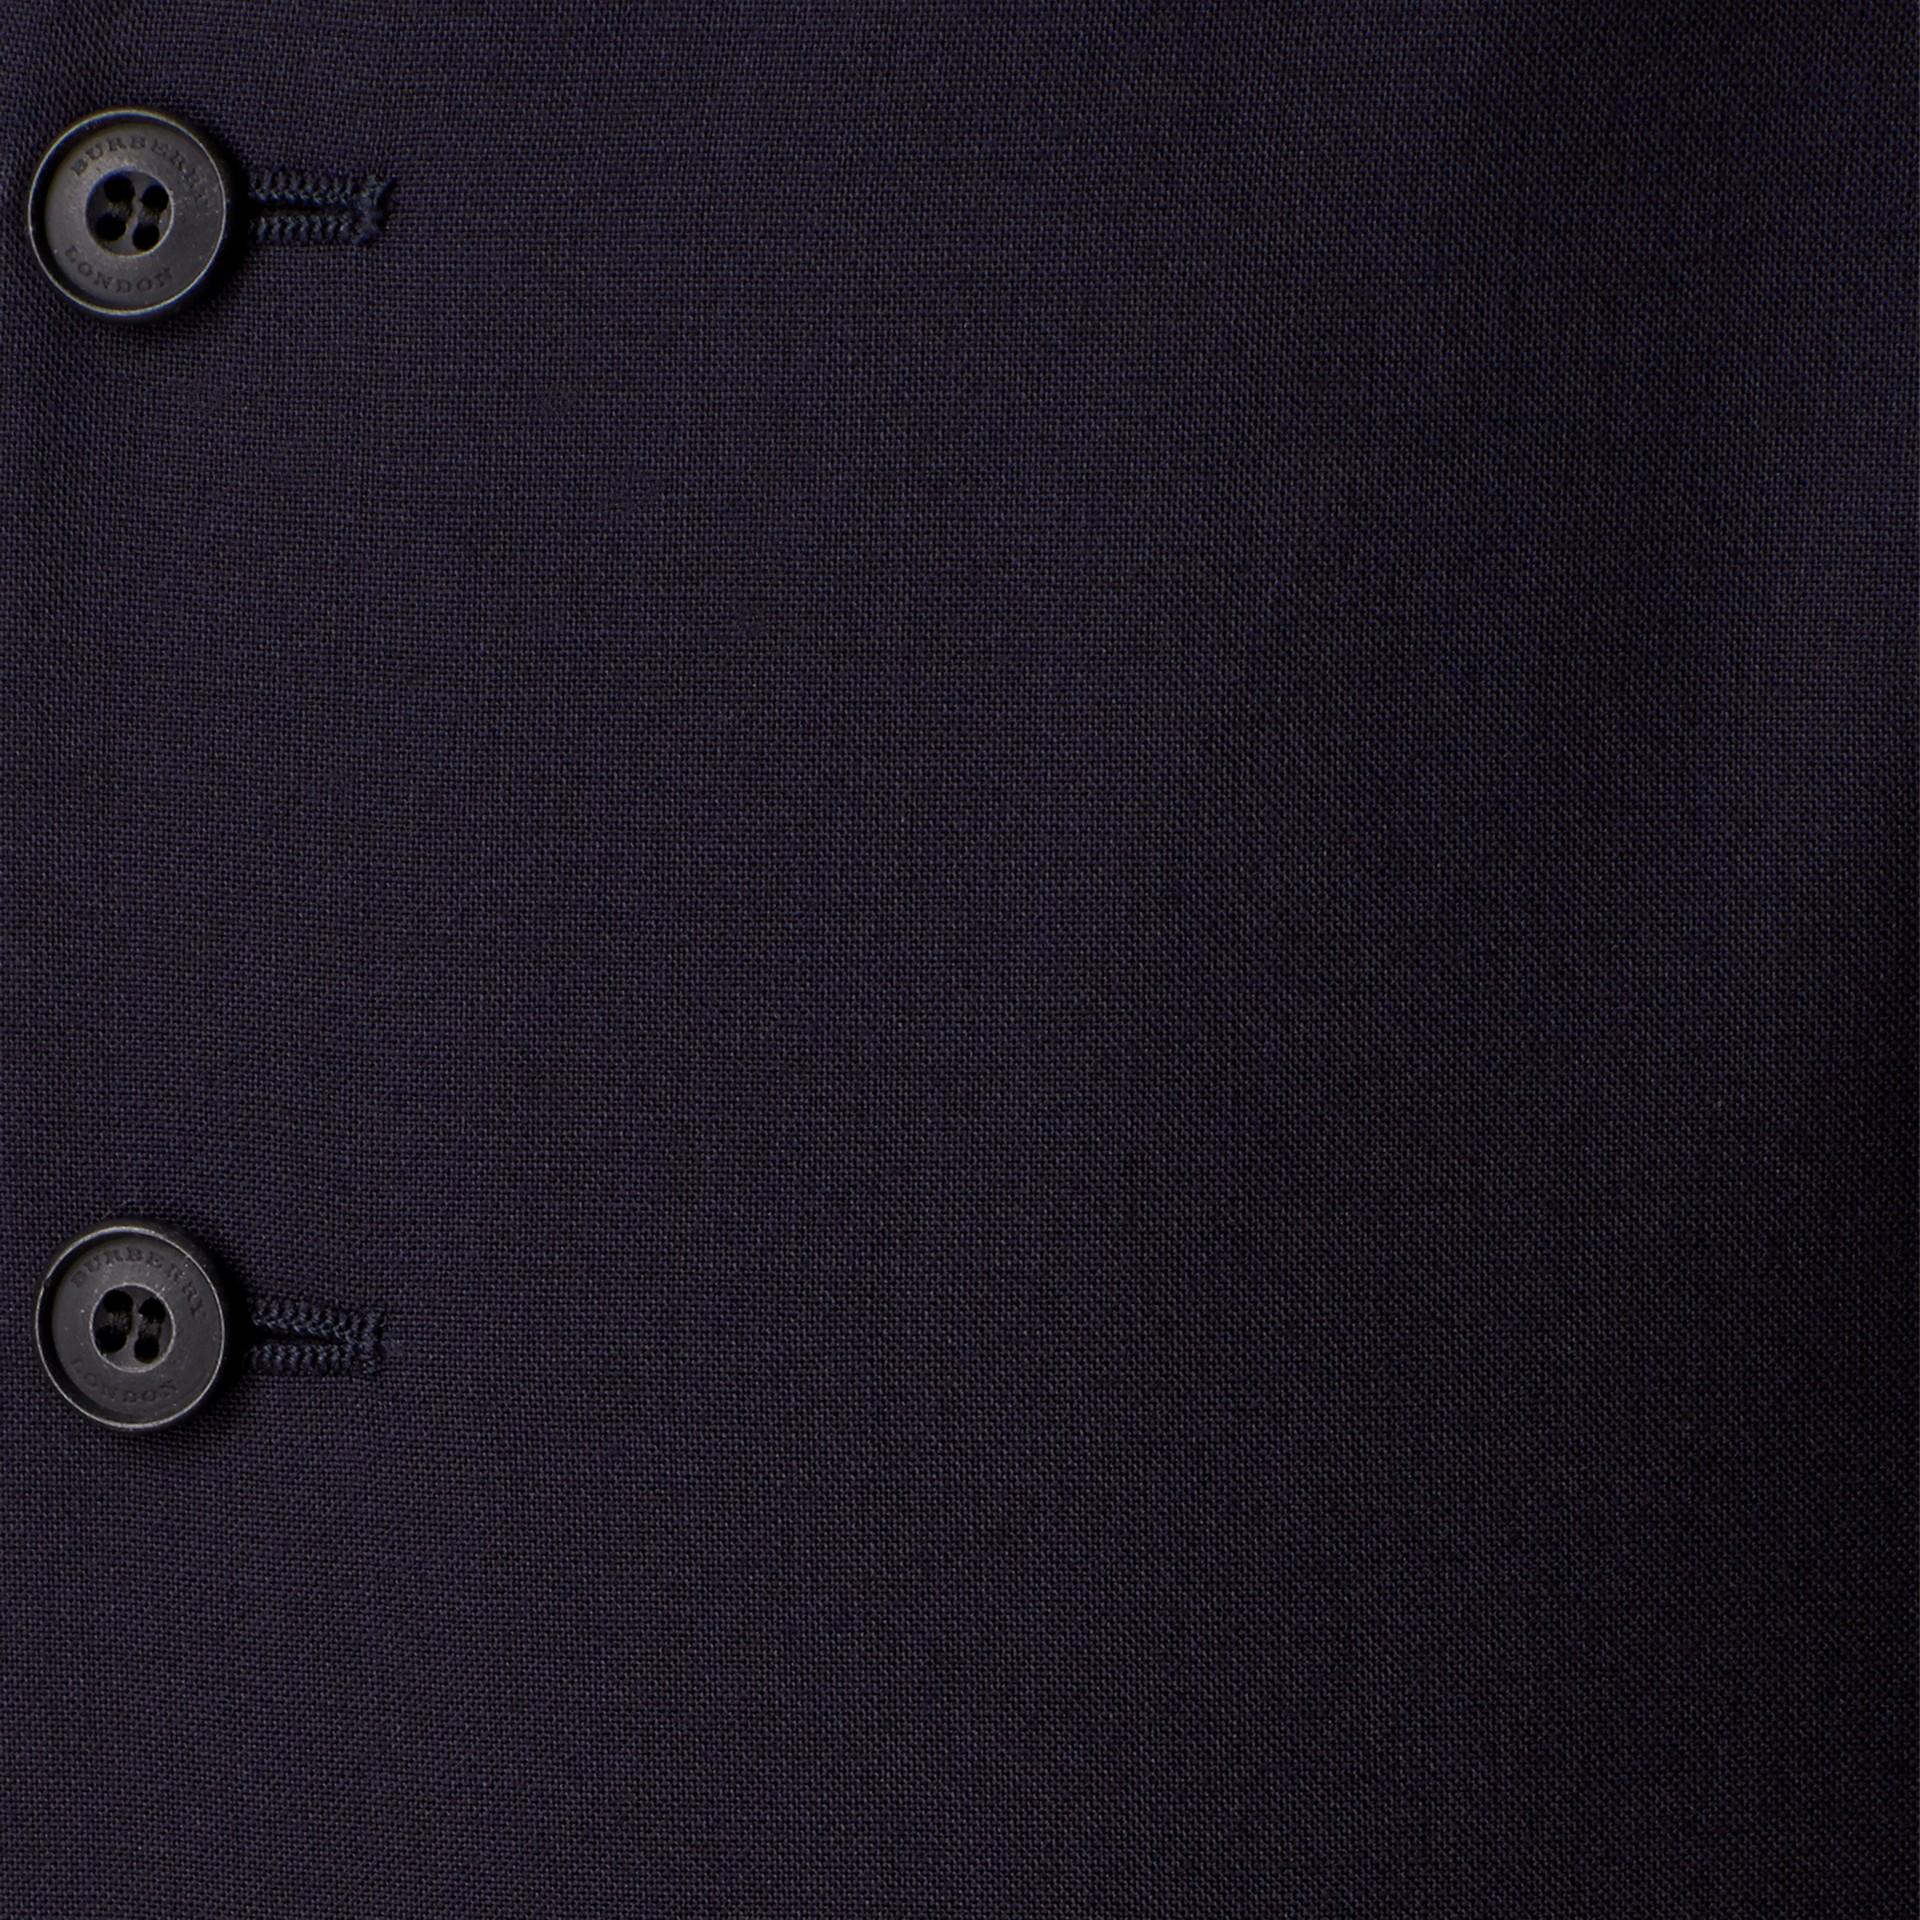 Marineblau Körperbetonter Waistcoat aus Wolle - Galerie-Bild 2